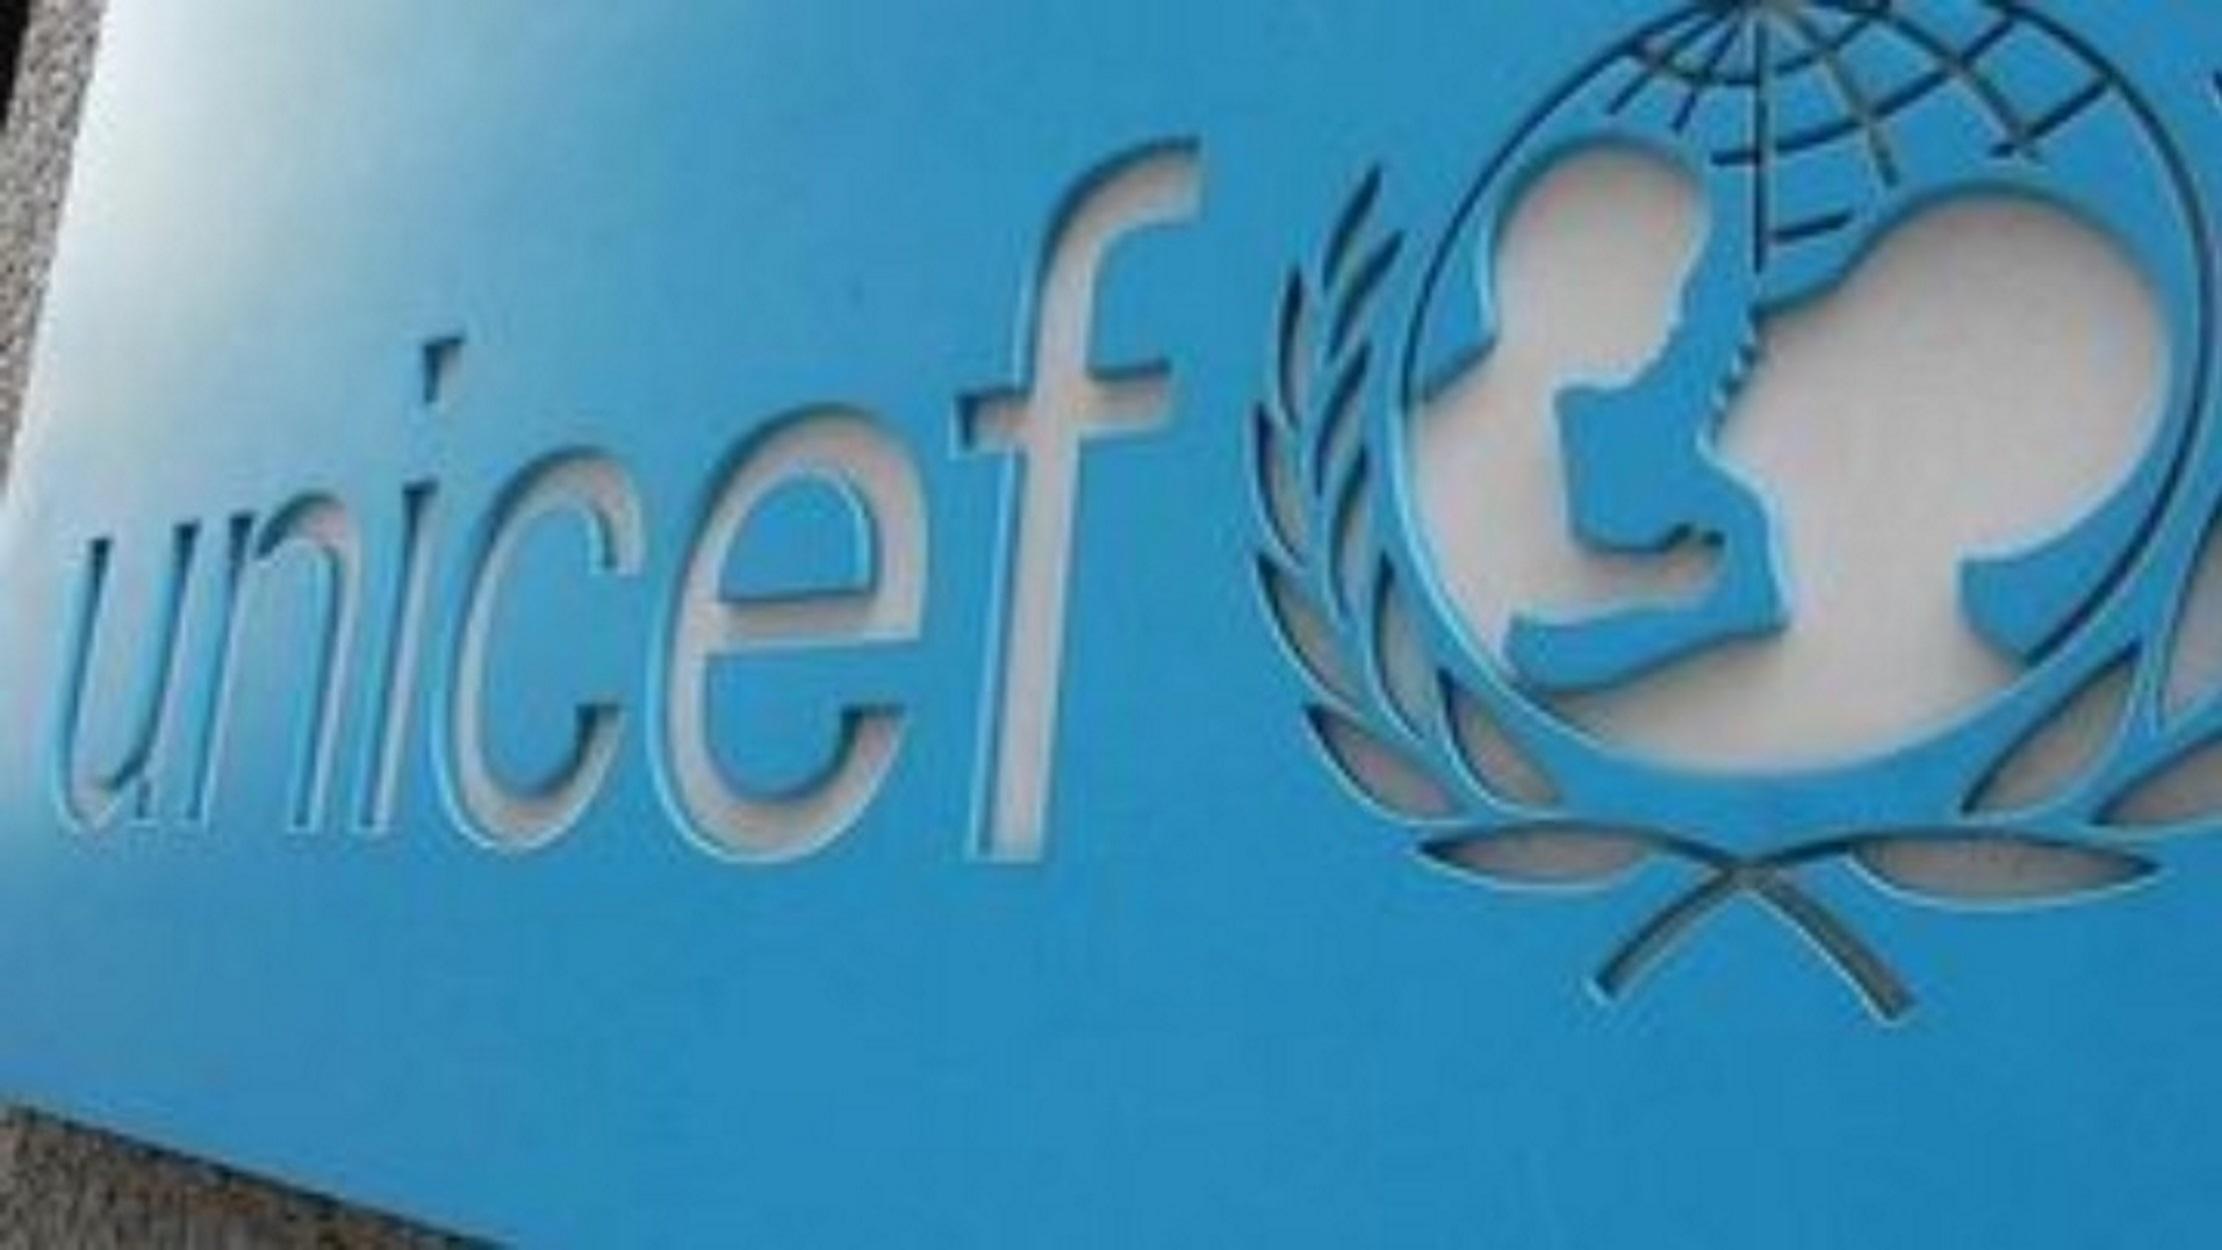 UNICEF: Δραματική έκκληση για τις ζωές 39 εκατομμυρίων παιδιών